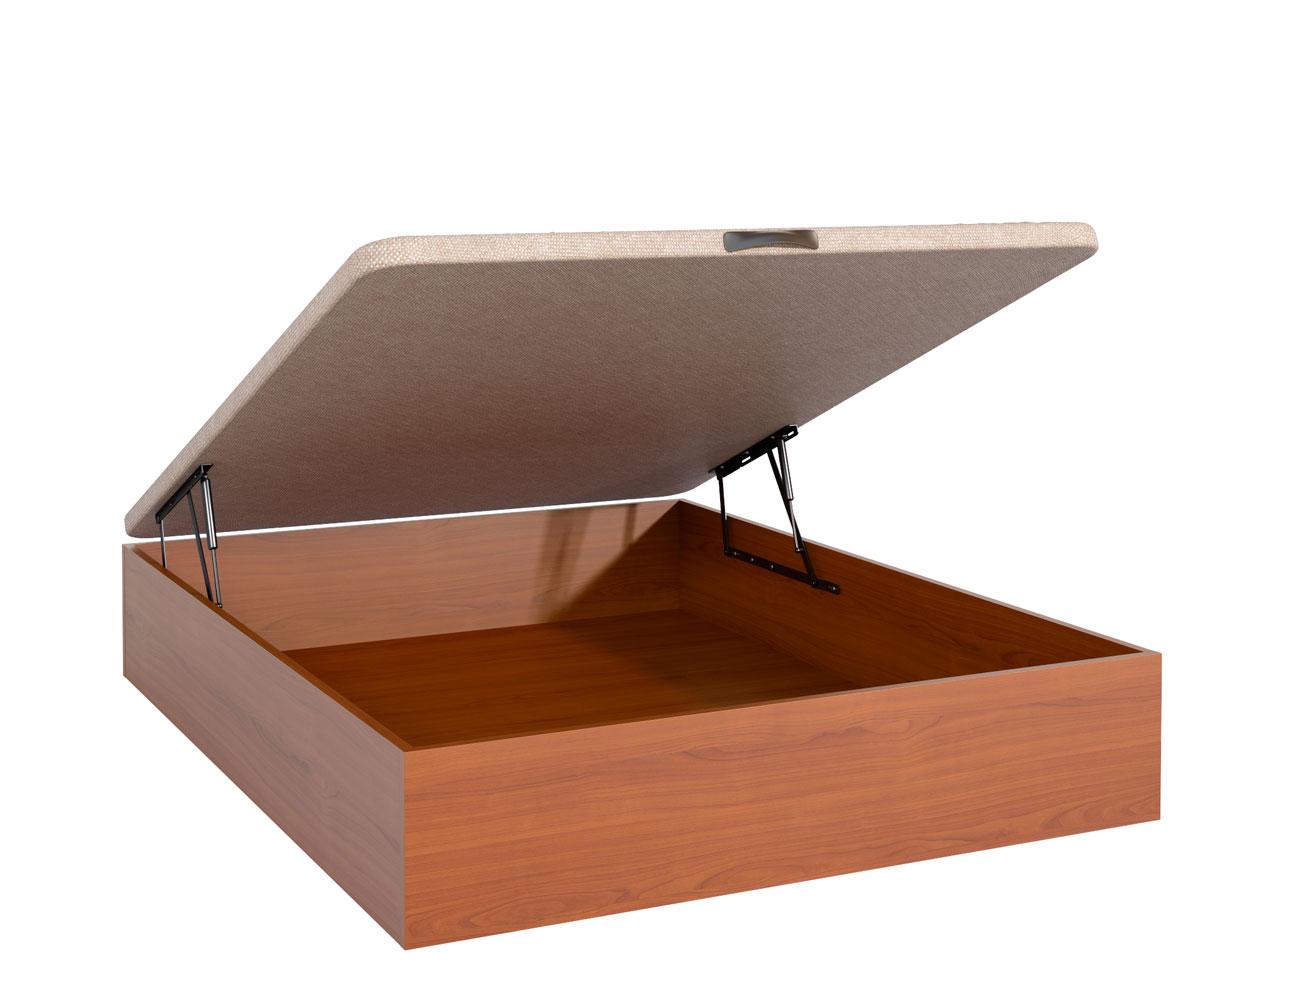 Canape madera nogal tapa 3d barato tajo abierto1